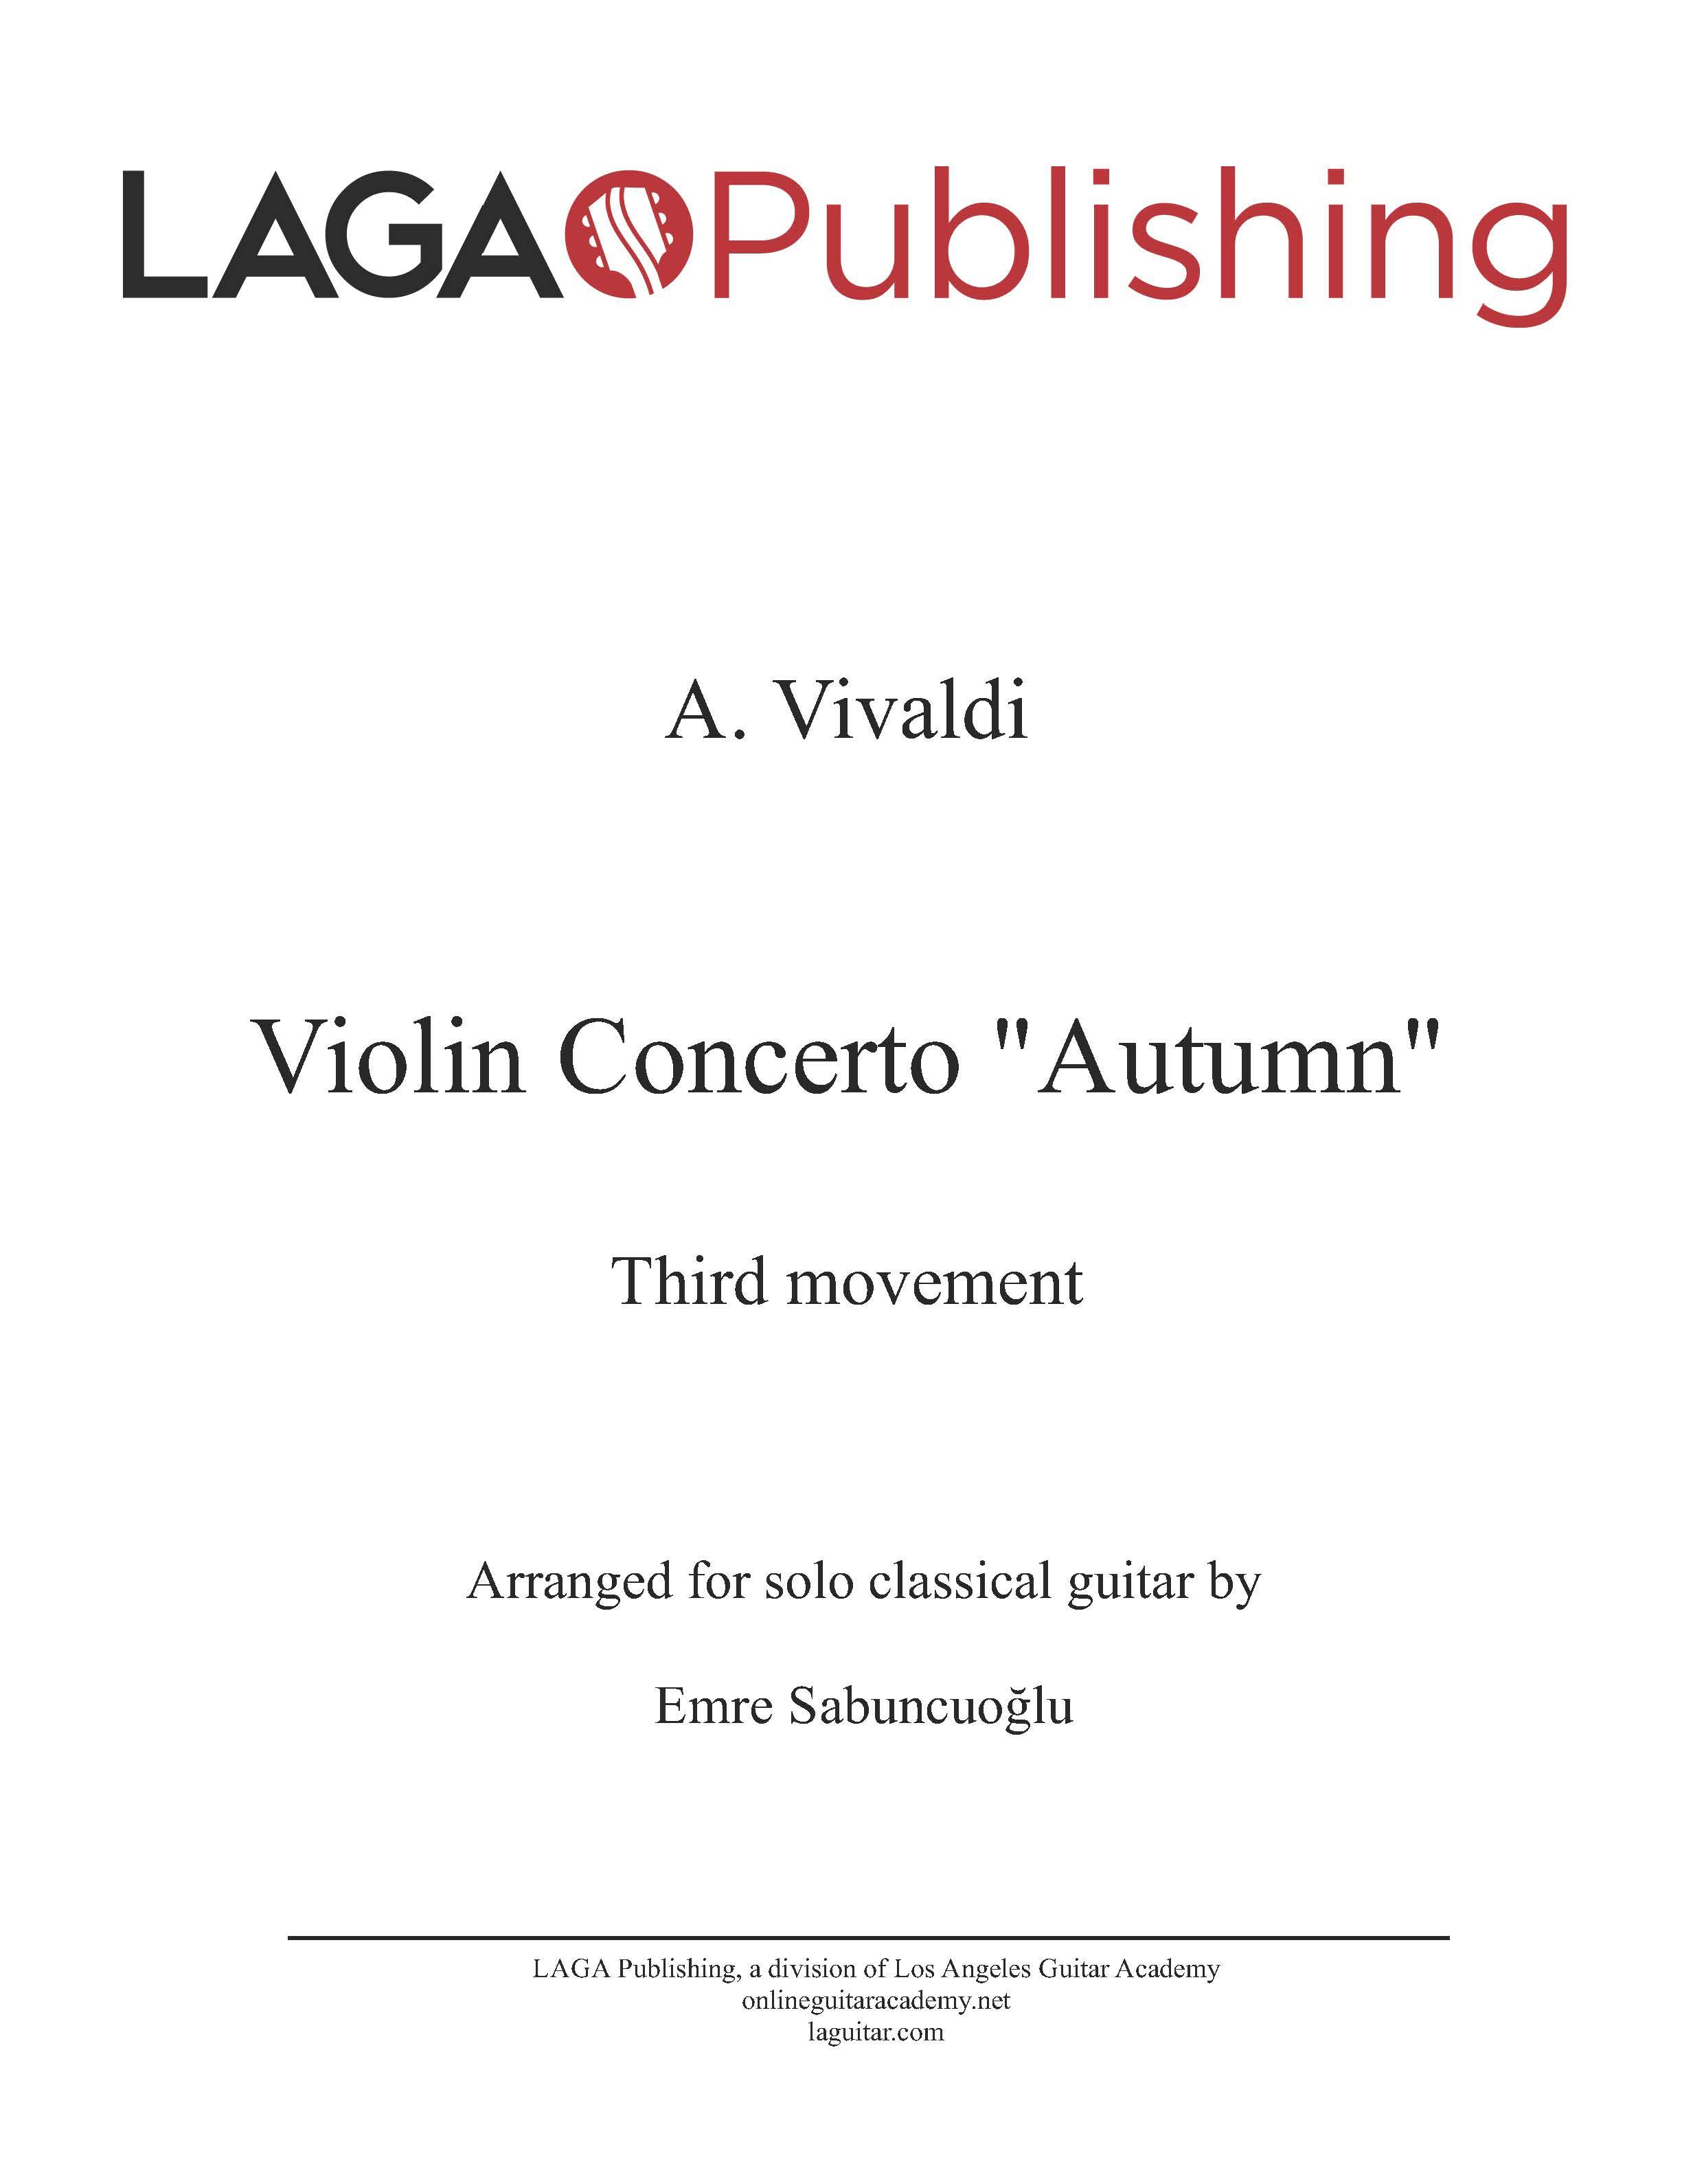 laga-publishing-vivaldi-4seasons-autumn-iii_page_01